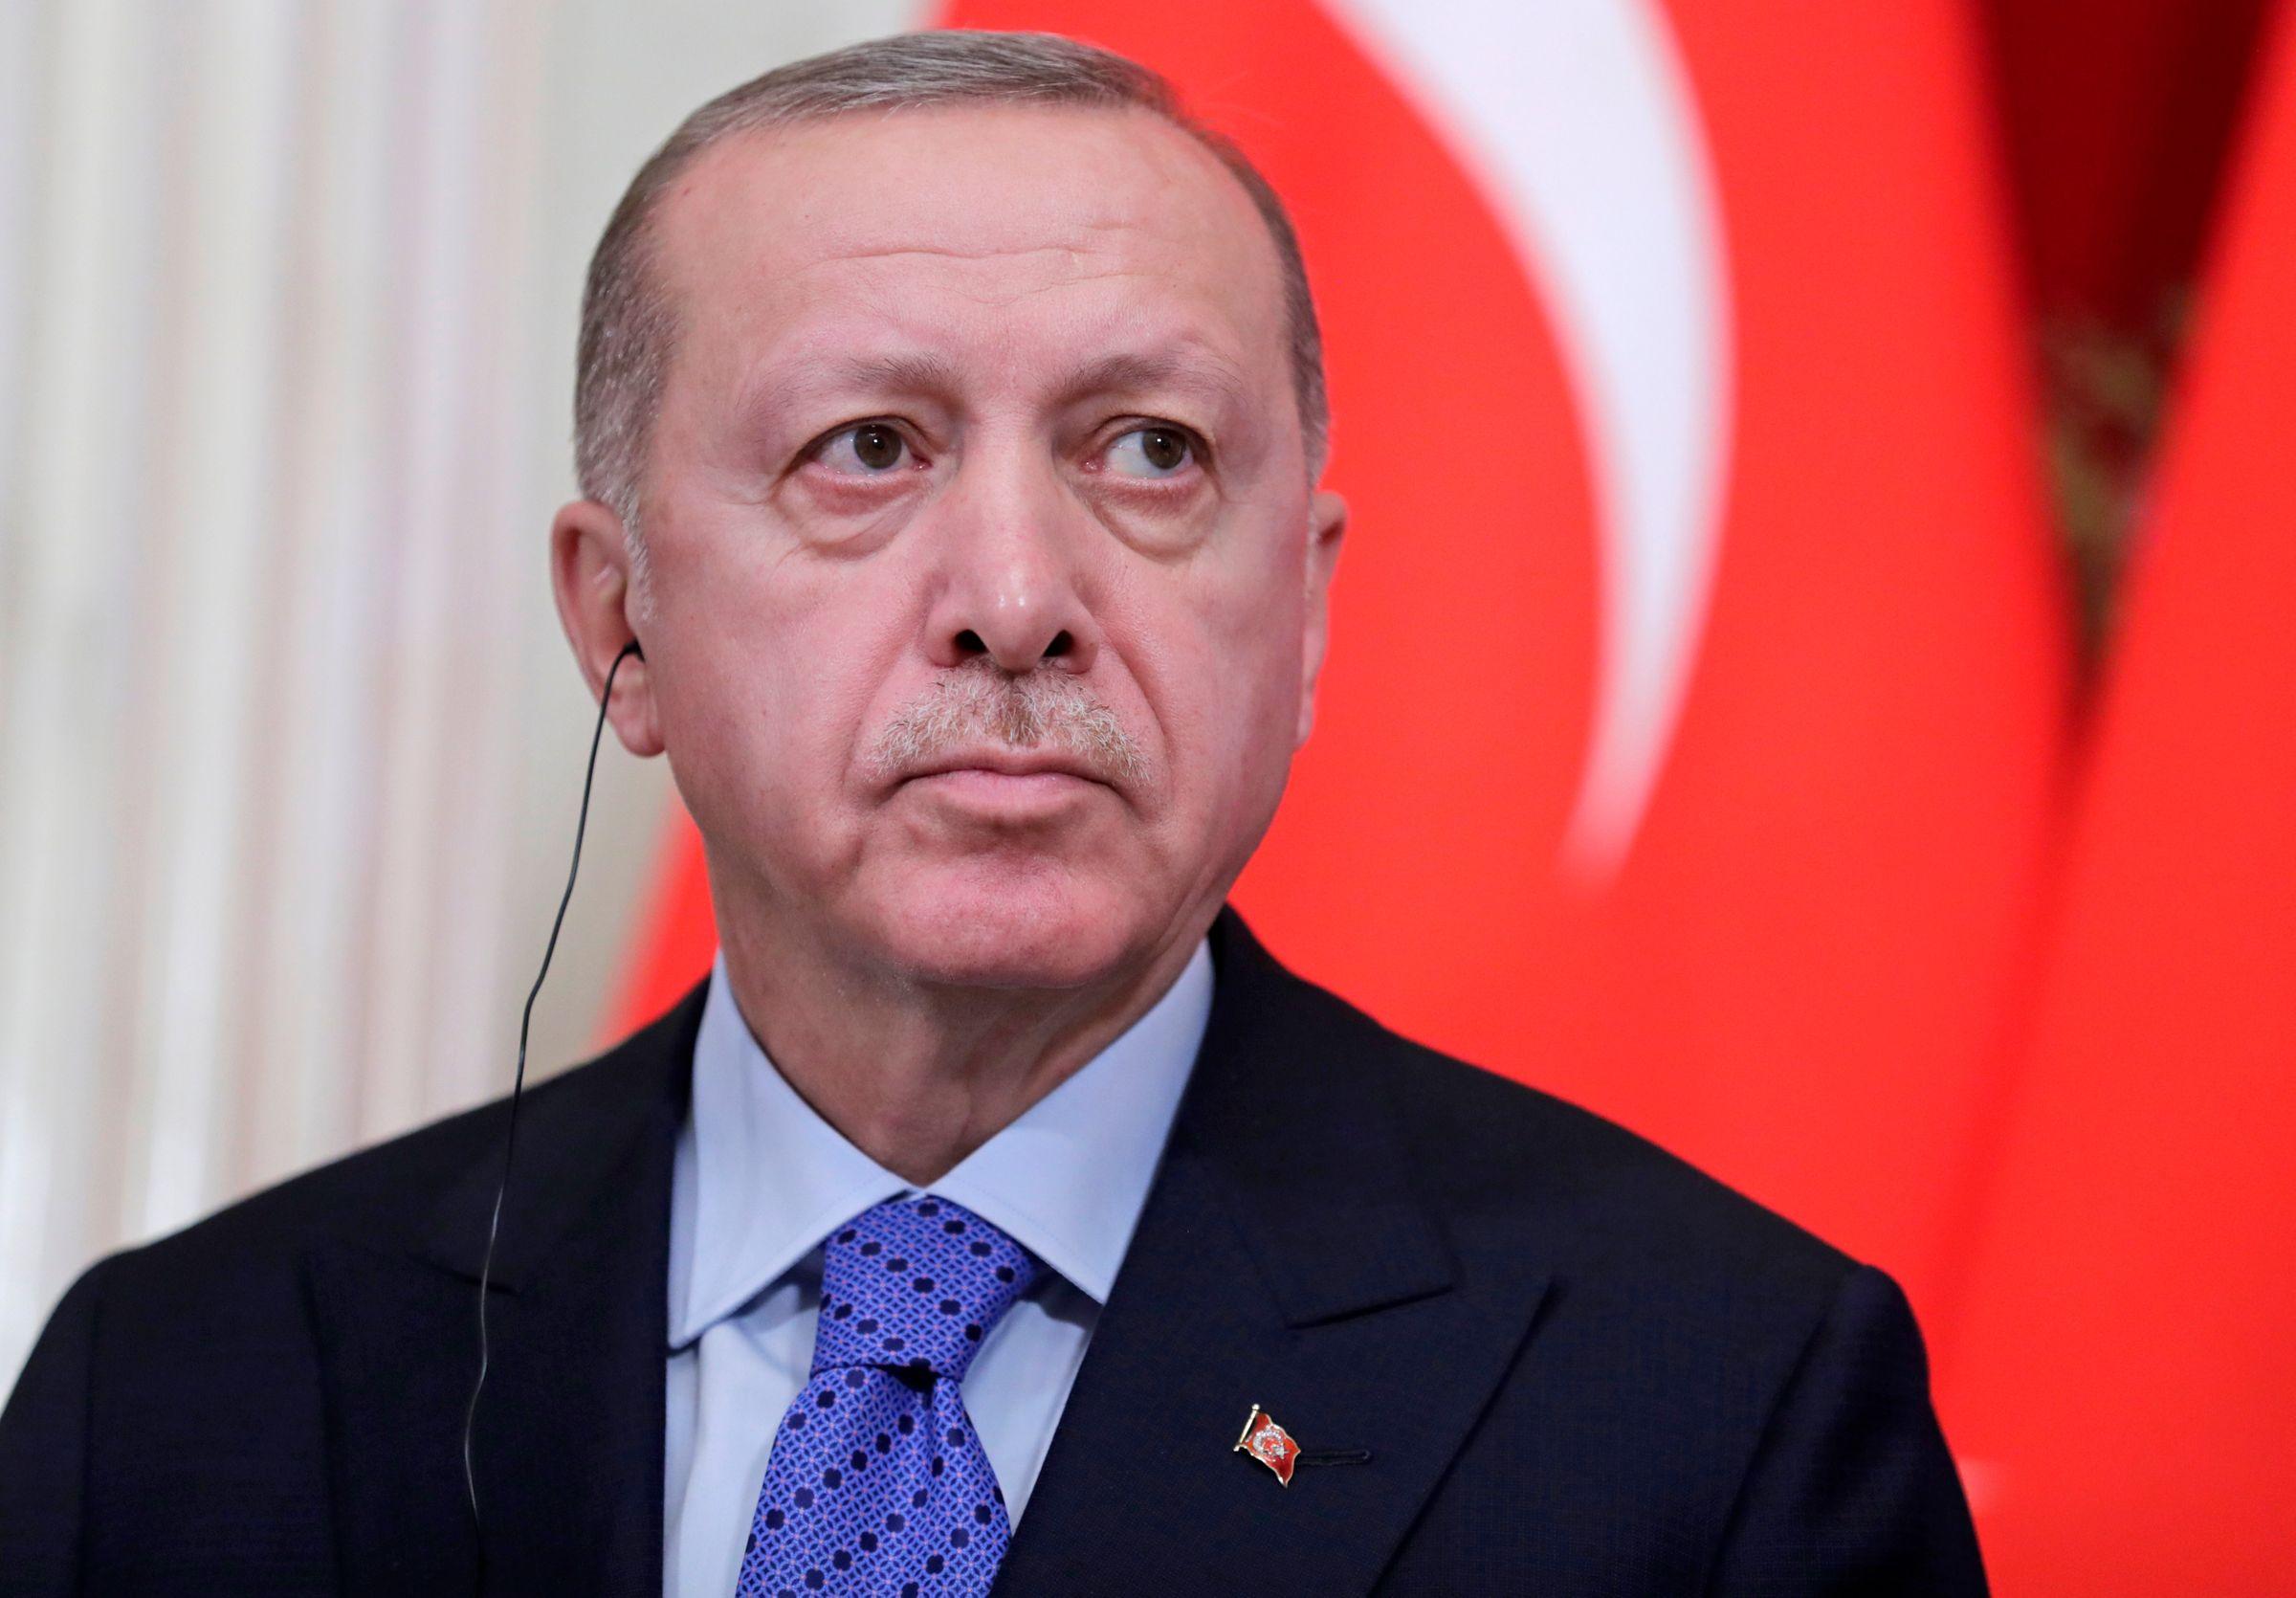 <p>Президент Турции Реджеп Тайип Эрдоган. Фото © ТАСС / Метцель Михаил</p>